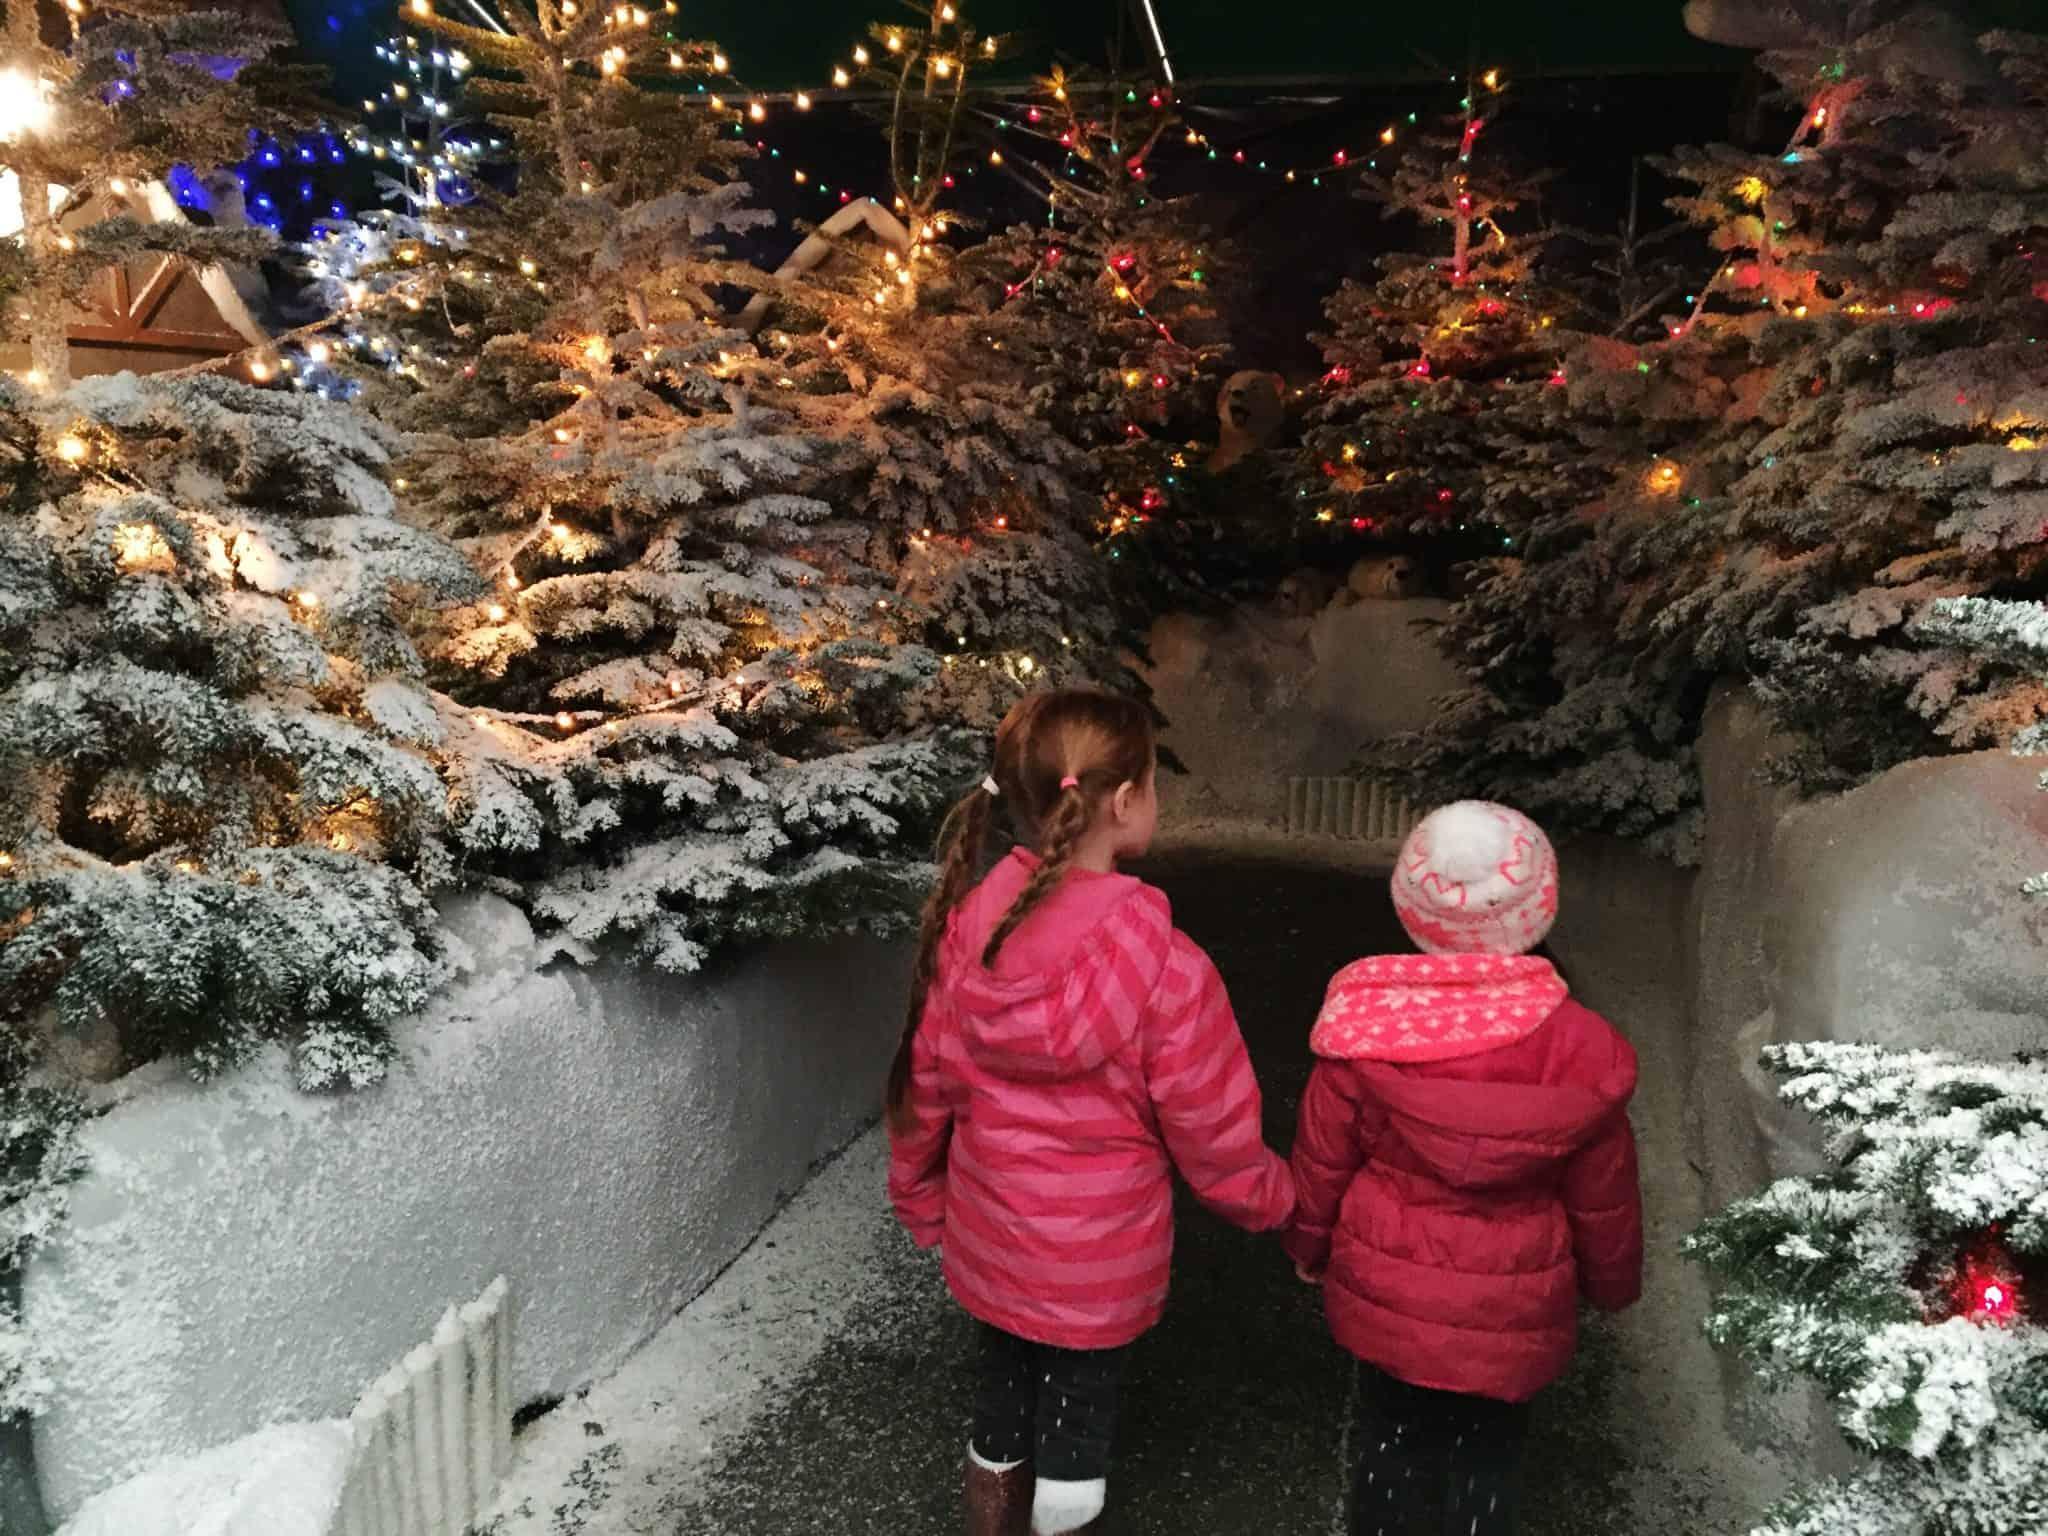 Entering the magical World's End Winter Wonderland